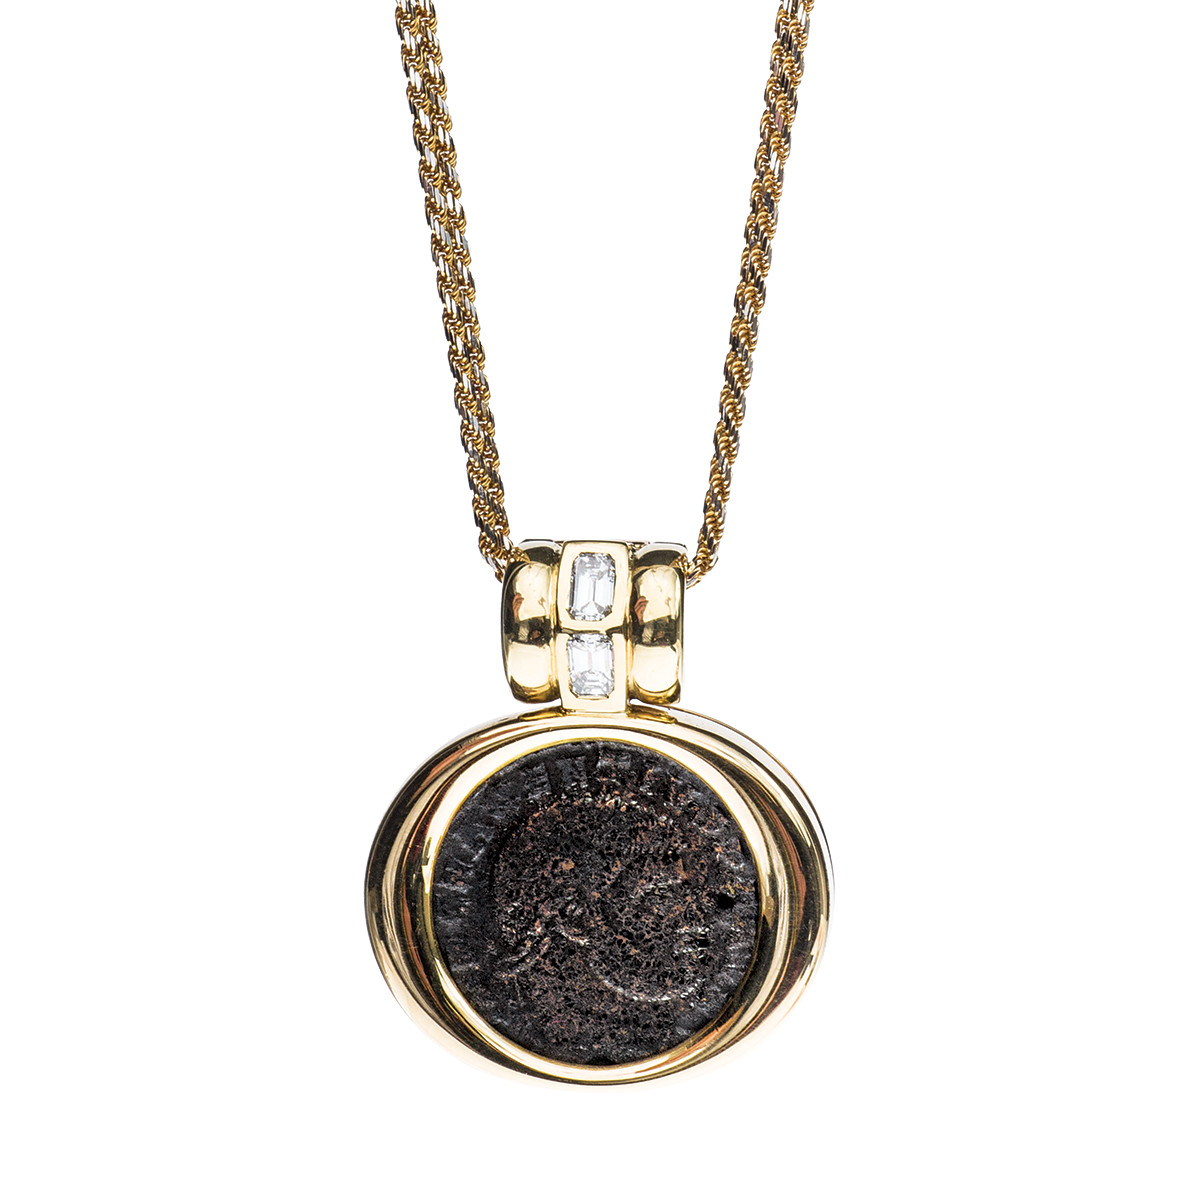 Vintage 18K Roman Coin Diamond Pendant